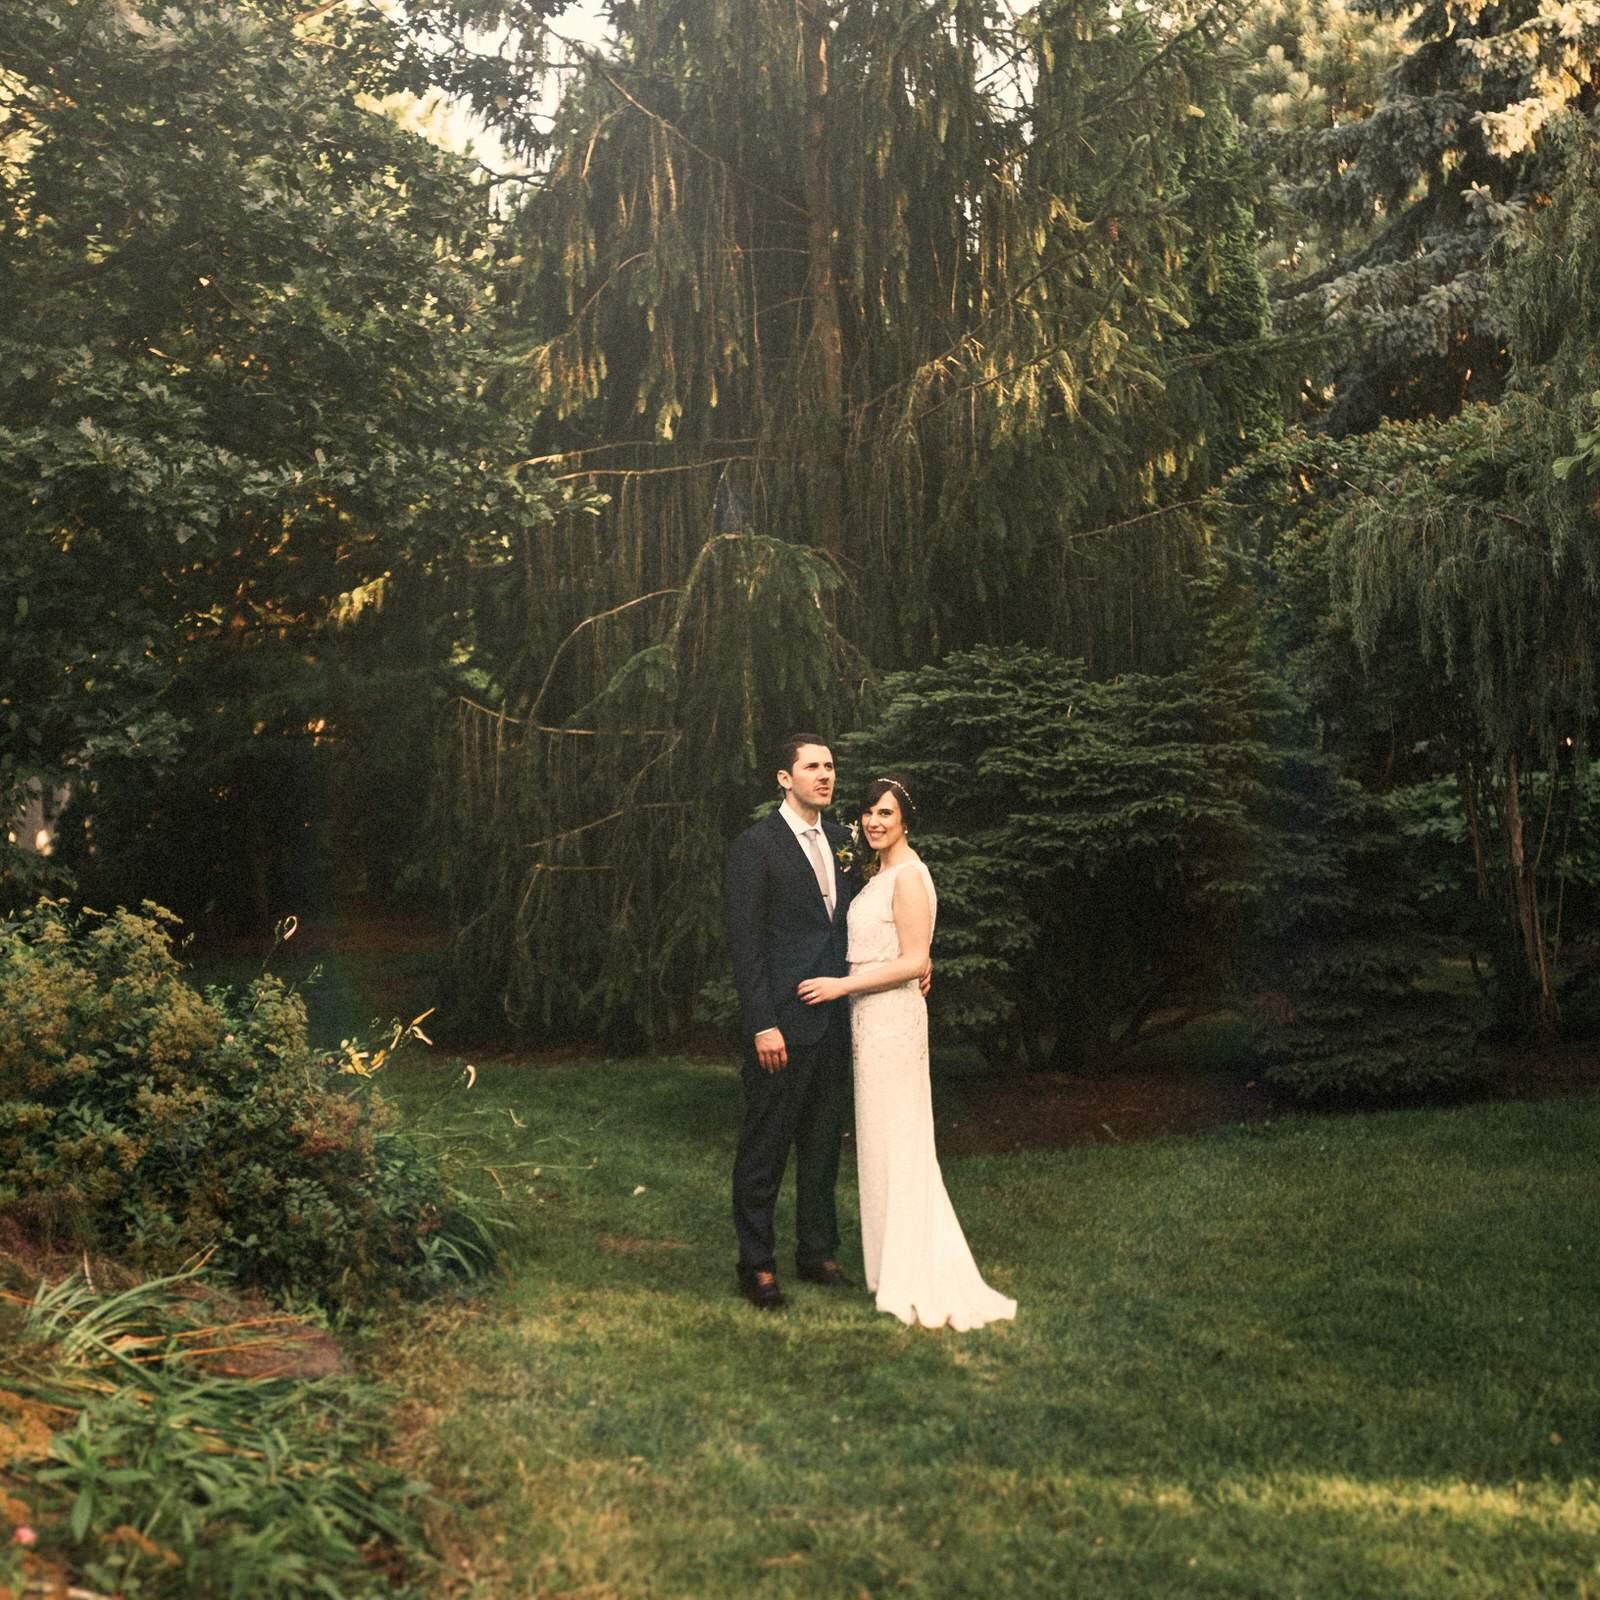 chryssi_romain_wedding_280.JPG